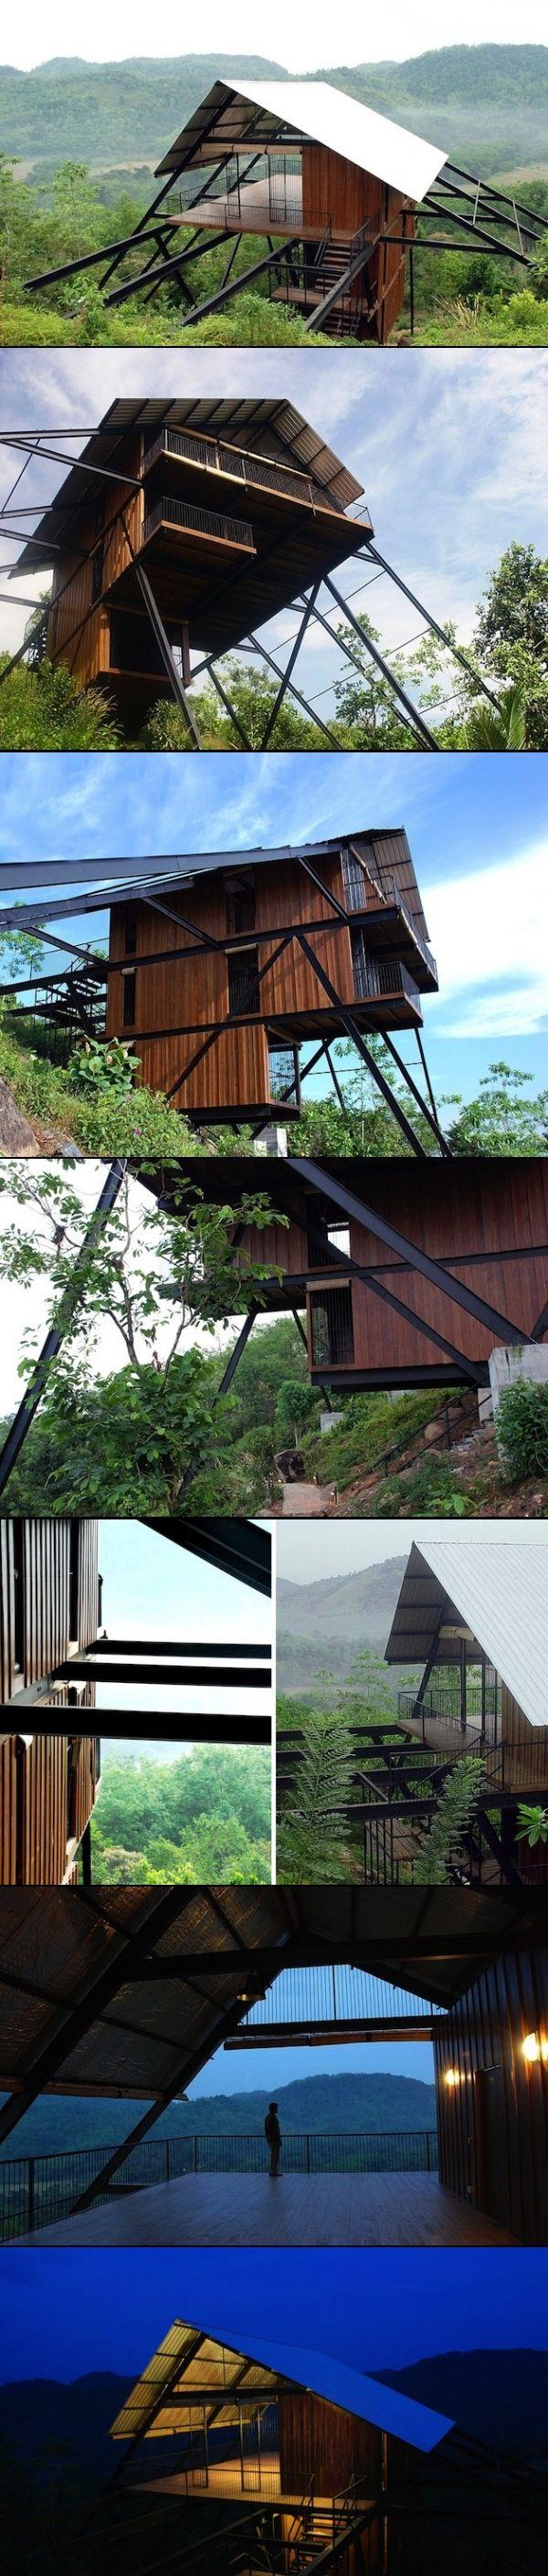 Sri Lanka Open Timber Bungalow on Stilts - created via http://pinthemall.net